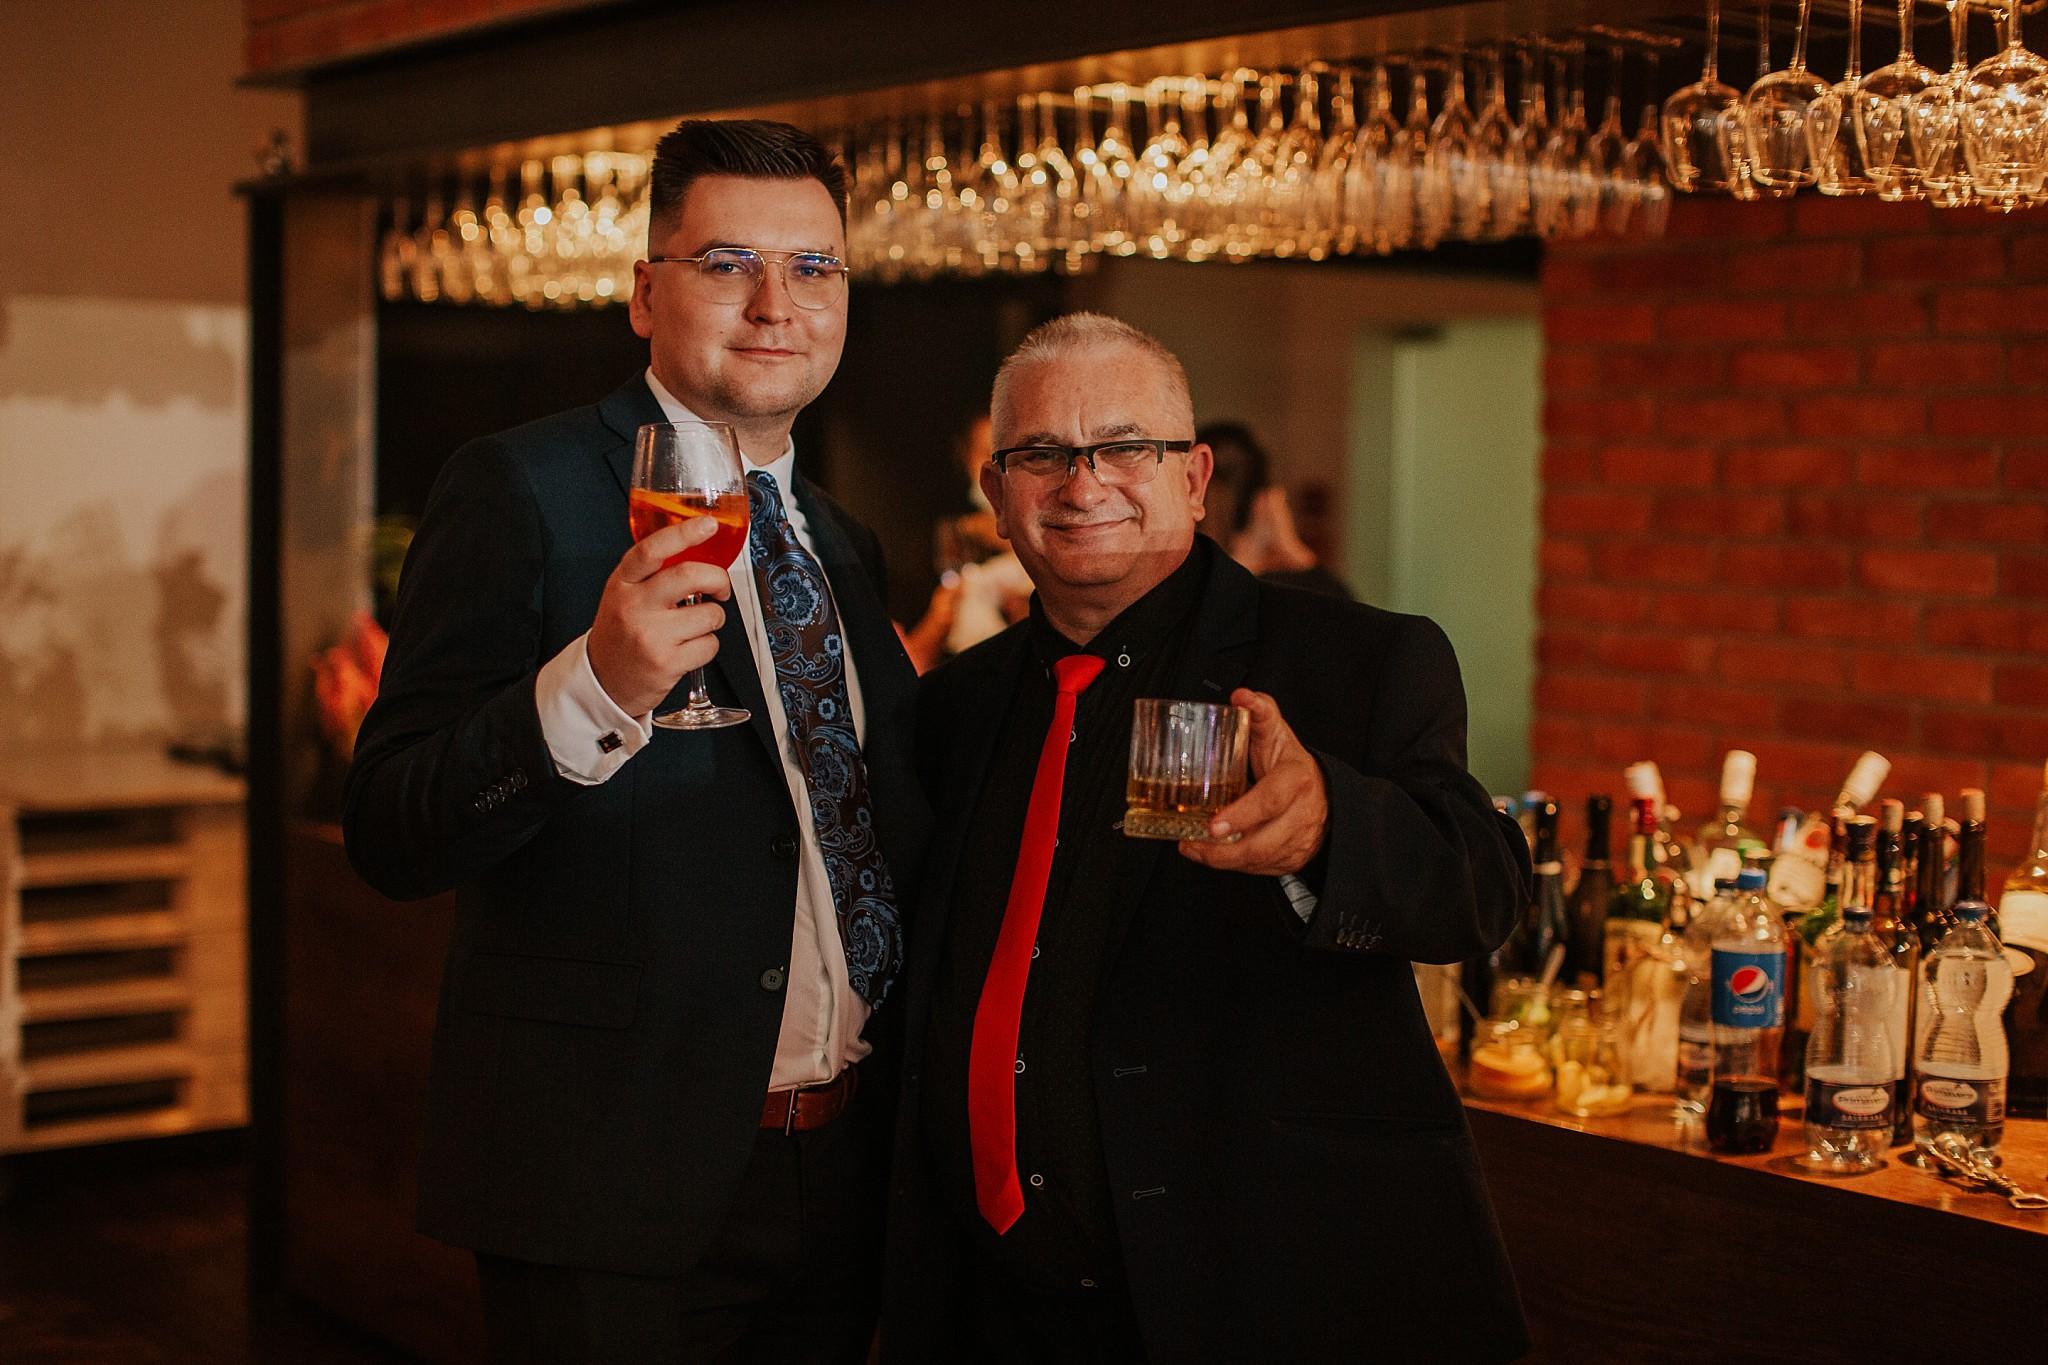 fotograf poznan wesele dobra truskawka piekne wesele pod poznaniem wesele w dobrej truskawce piekna para mloda slub marzen slub koronawirus slub listopad wesele koronawirus 462